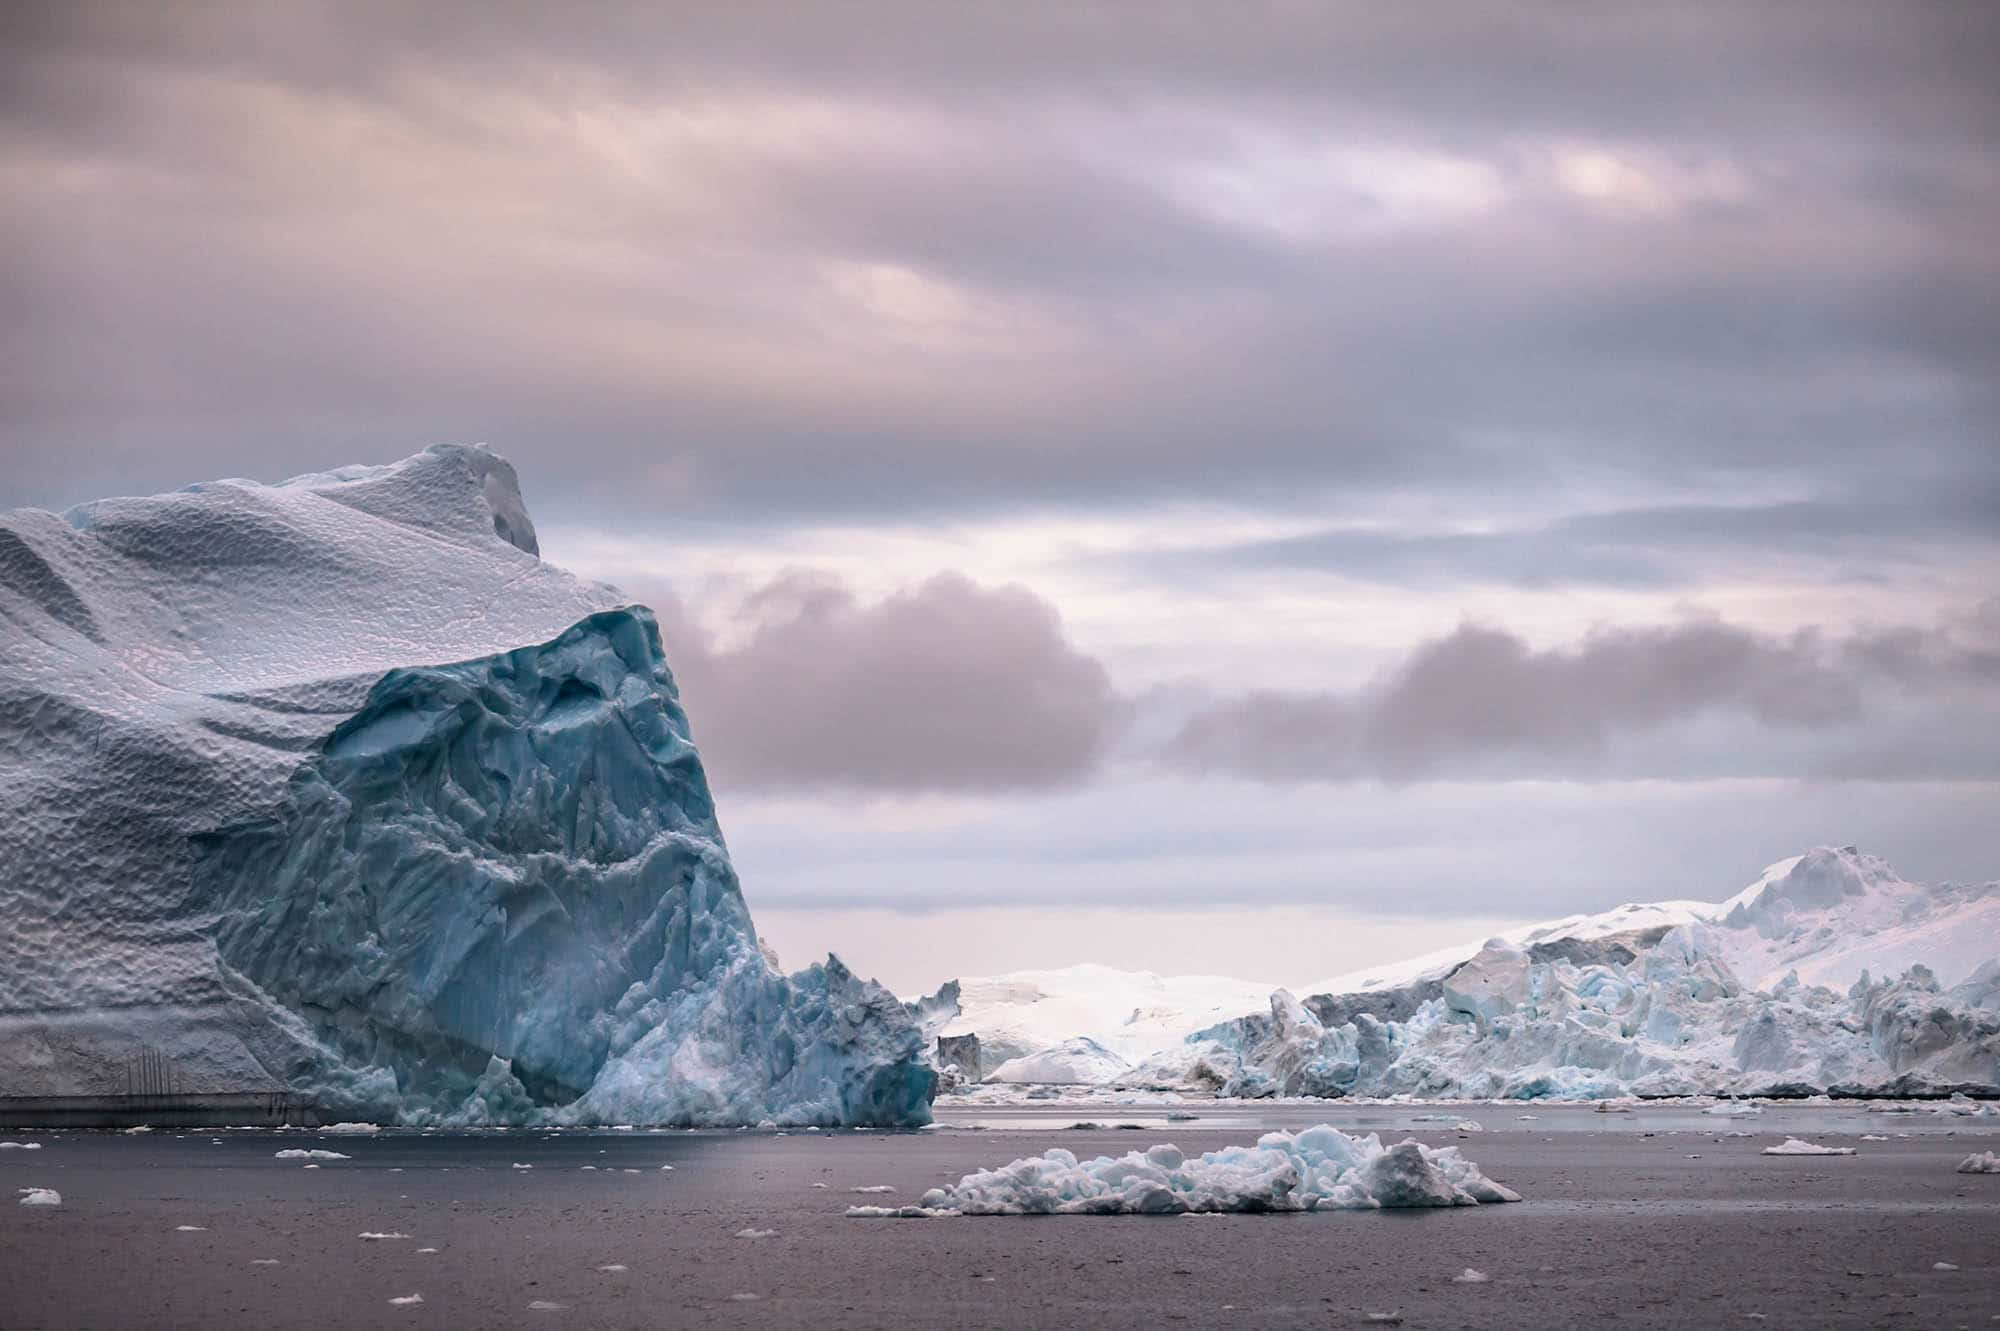 Ilulissat Greenland - Photo by Camilla Hylleberg - Visit Greenland